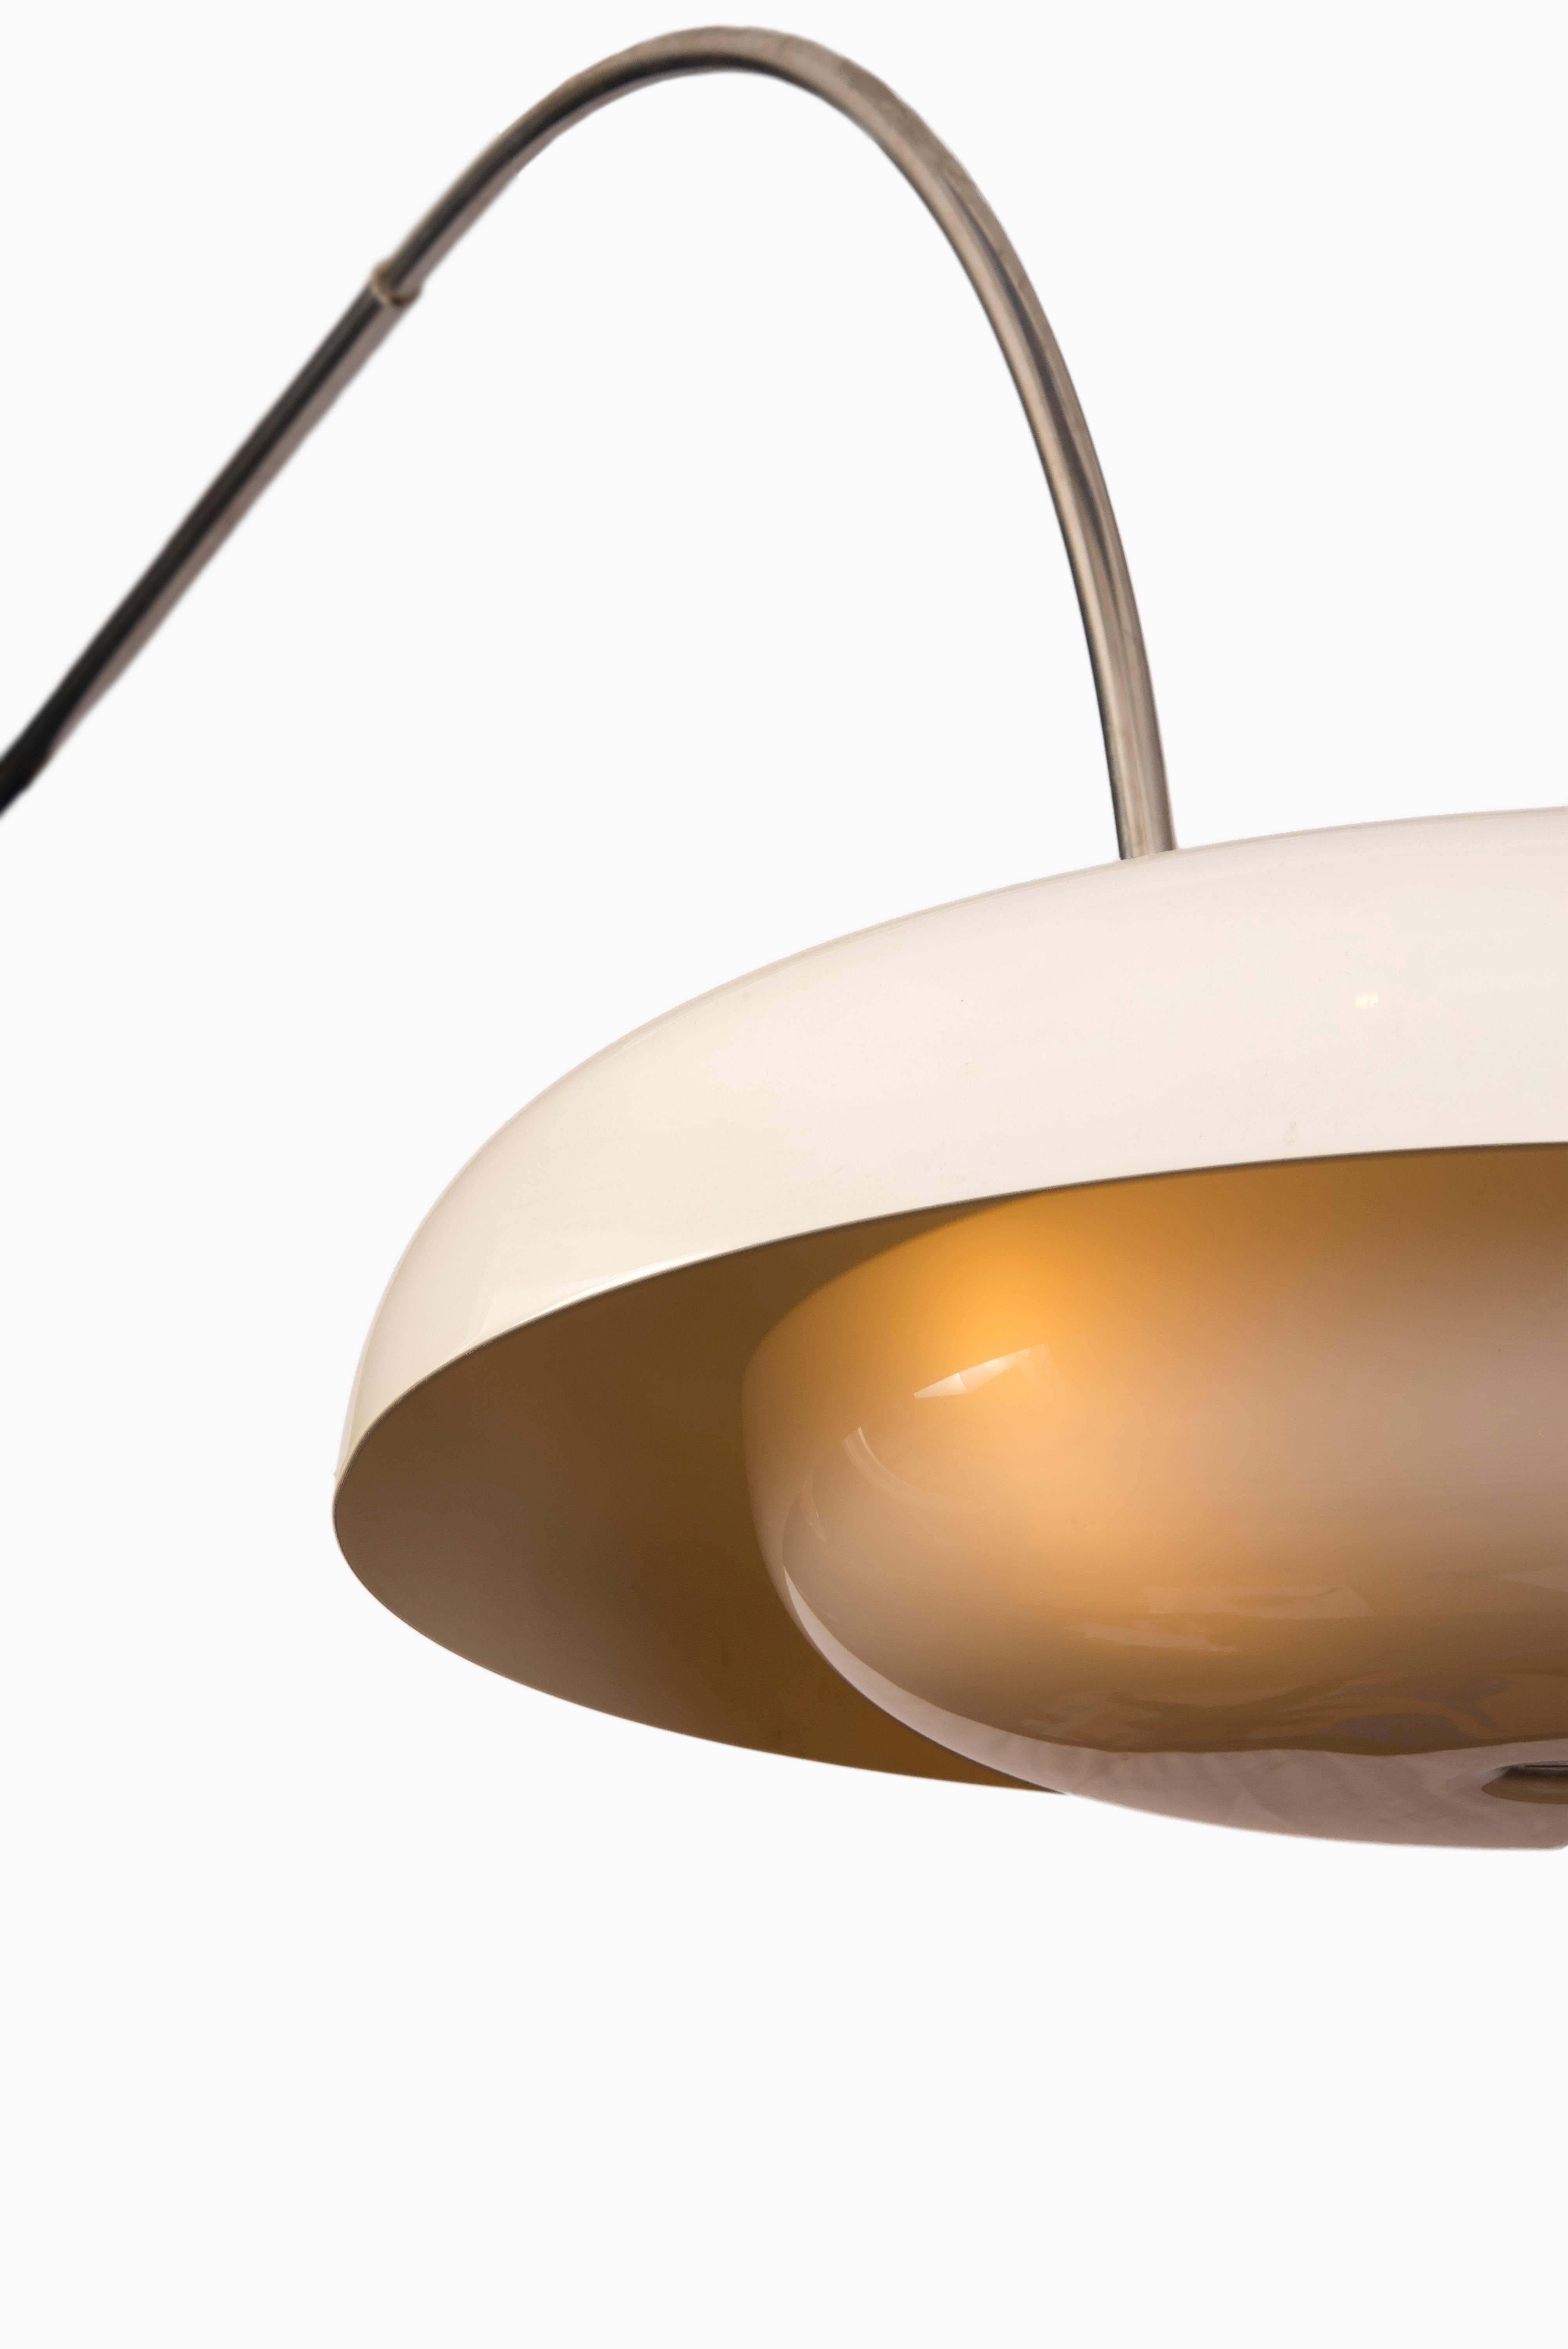 mdlabsupplies plasticware lamp consumables lab index glassware com